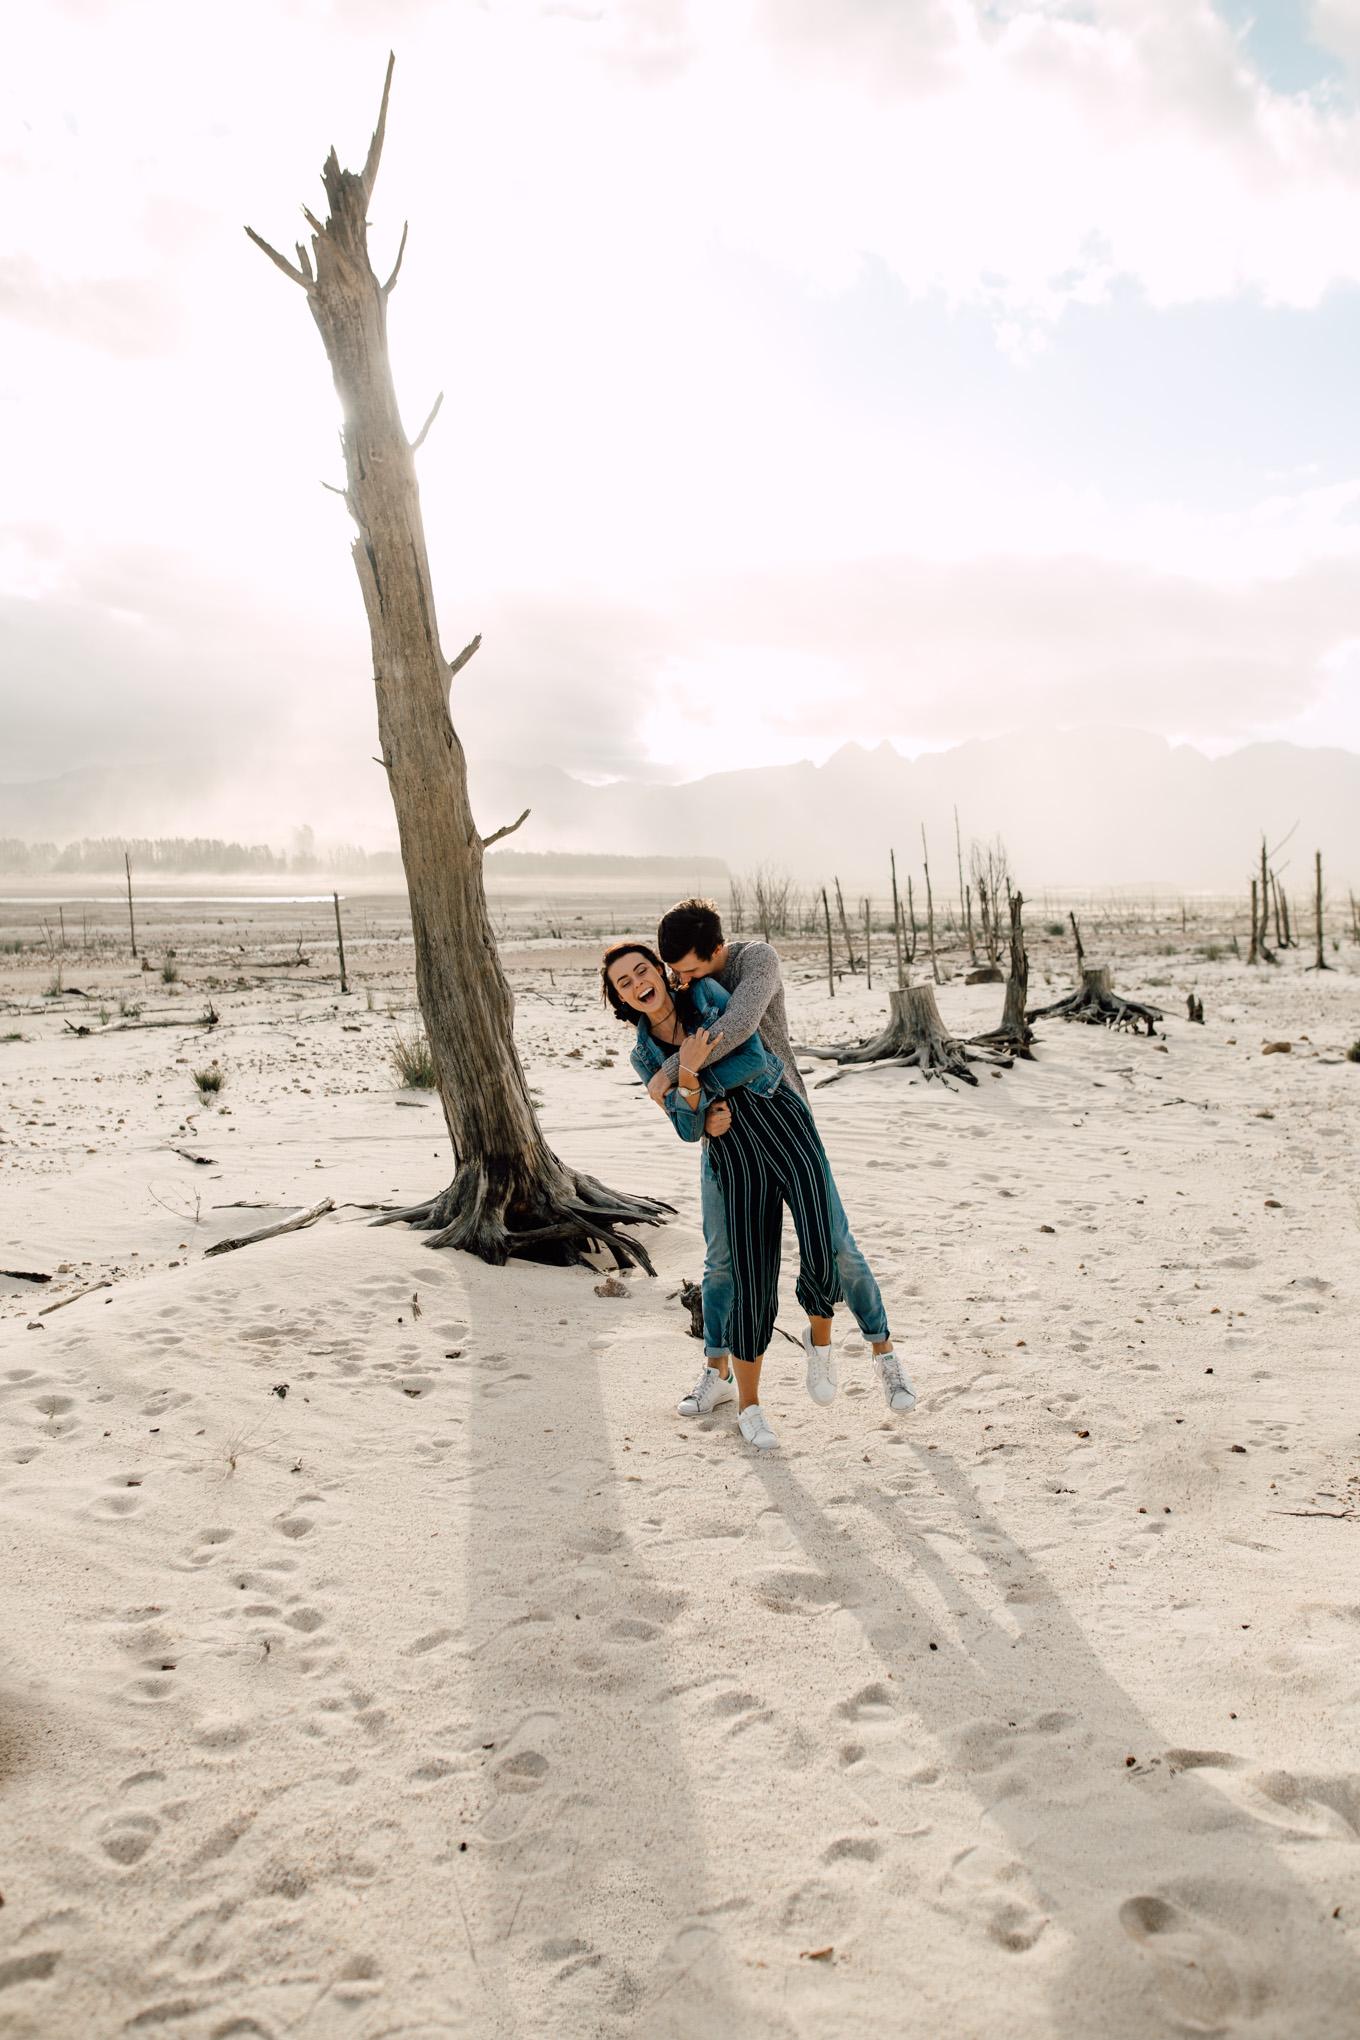 Cape-Town-Pia-Anna-Christian-Wedding-Photography-South-Africa-KF-32.jpg